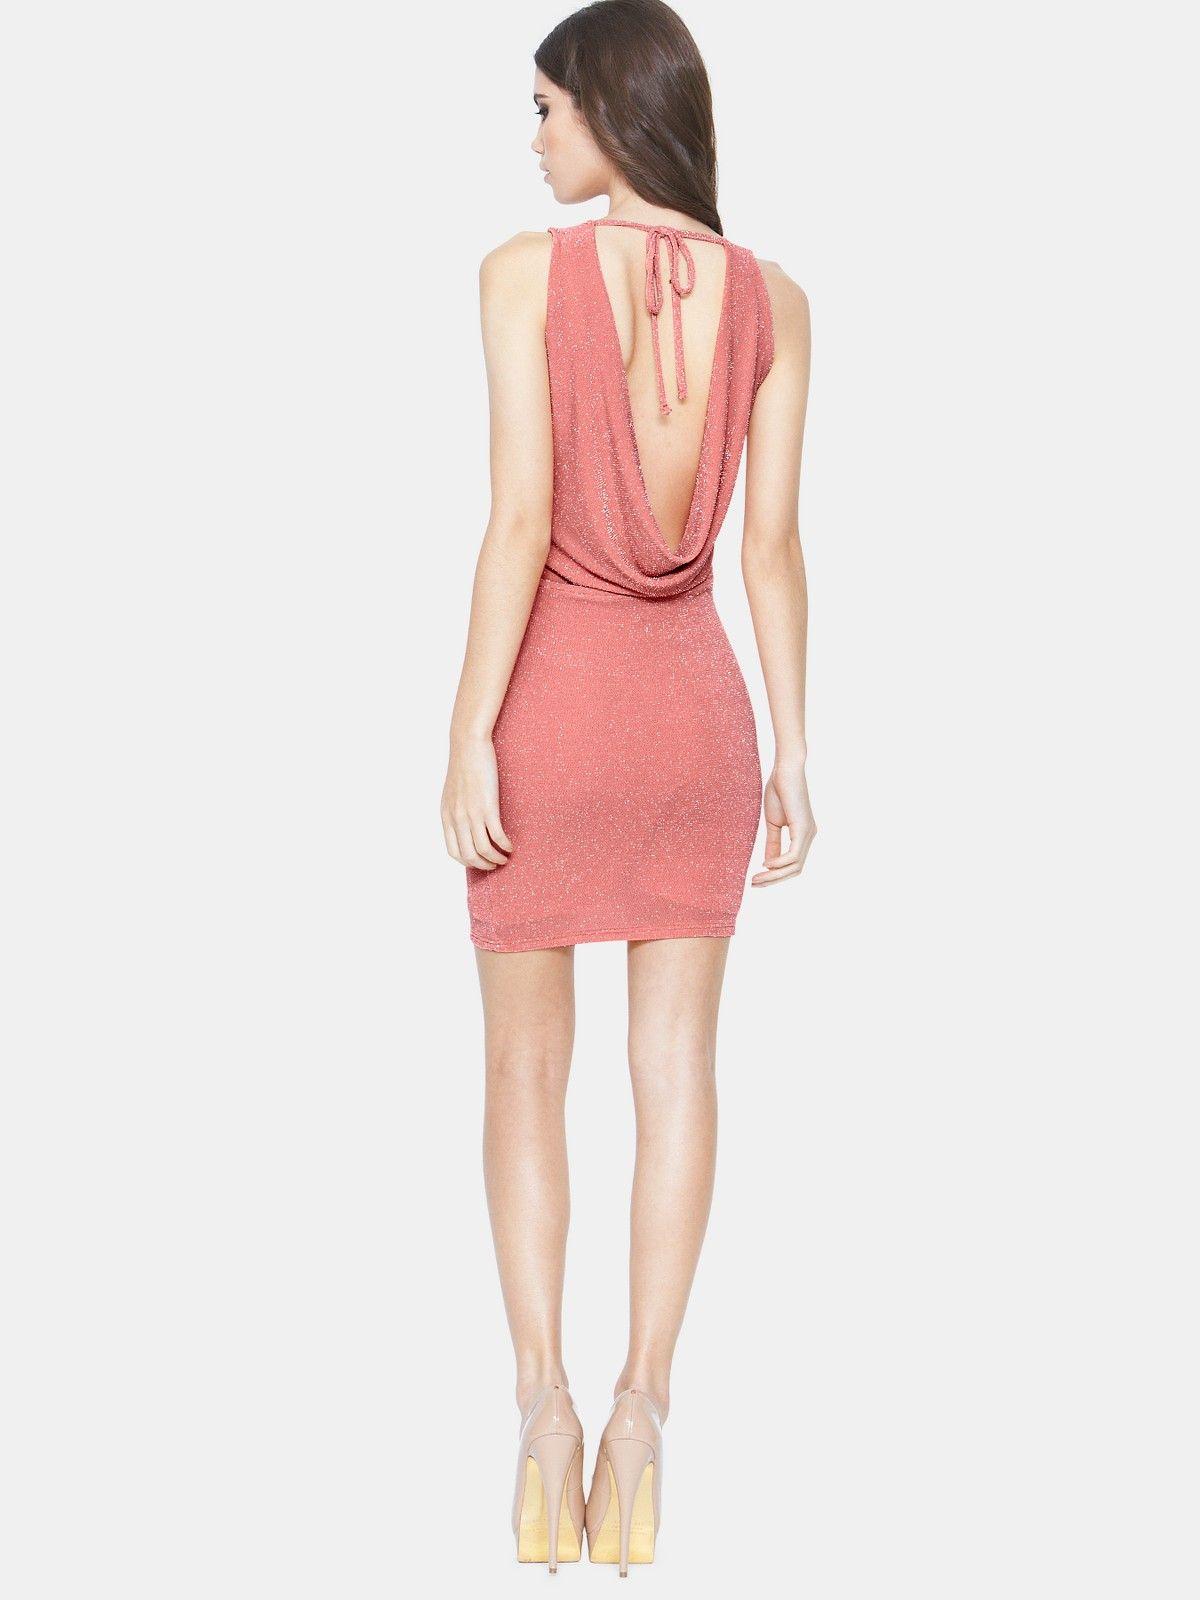 Lipsy Metallic Cowl Back Dress (1200×1600) | 1 Dresses and Skirts ...